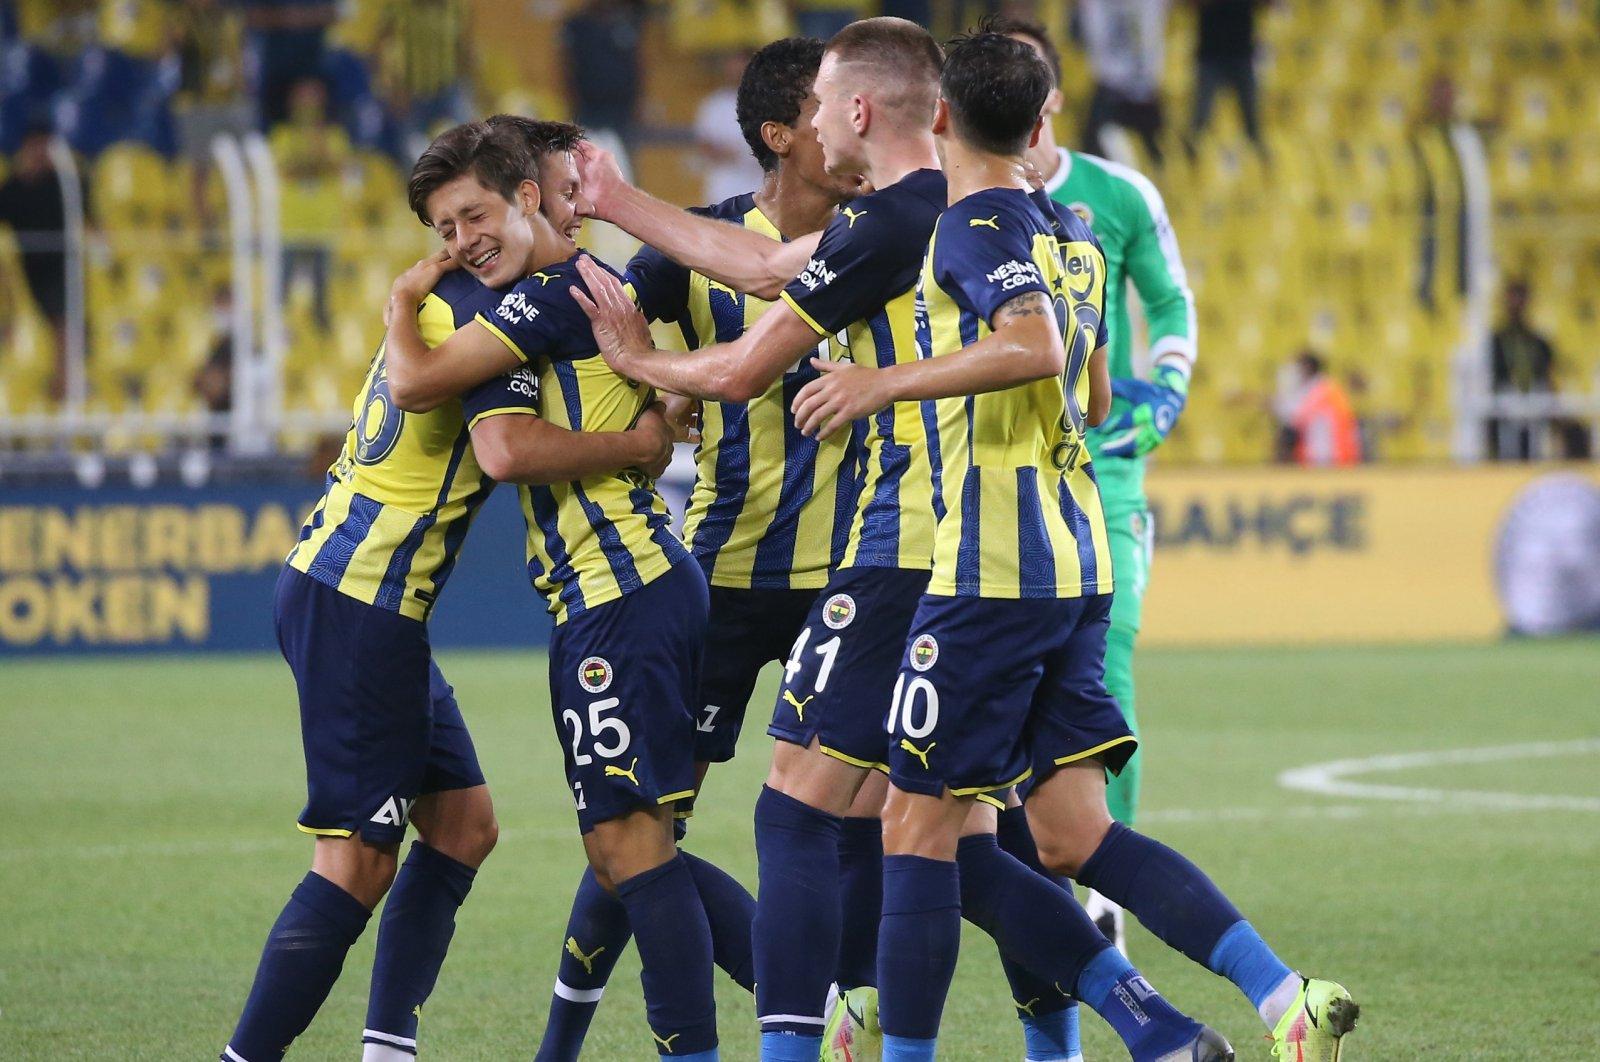 Fenerbahçe players celebrate a goal in a Turkish Süper Lig match against Antalyaspor, Istanbul, Turkey, Aug. 22, 2021.